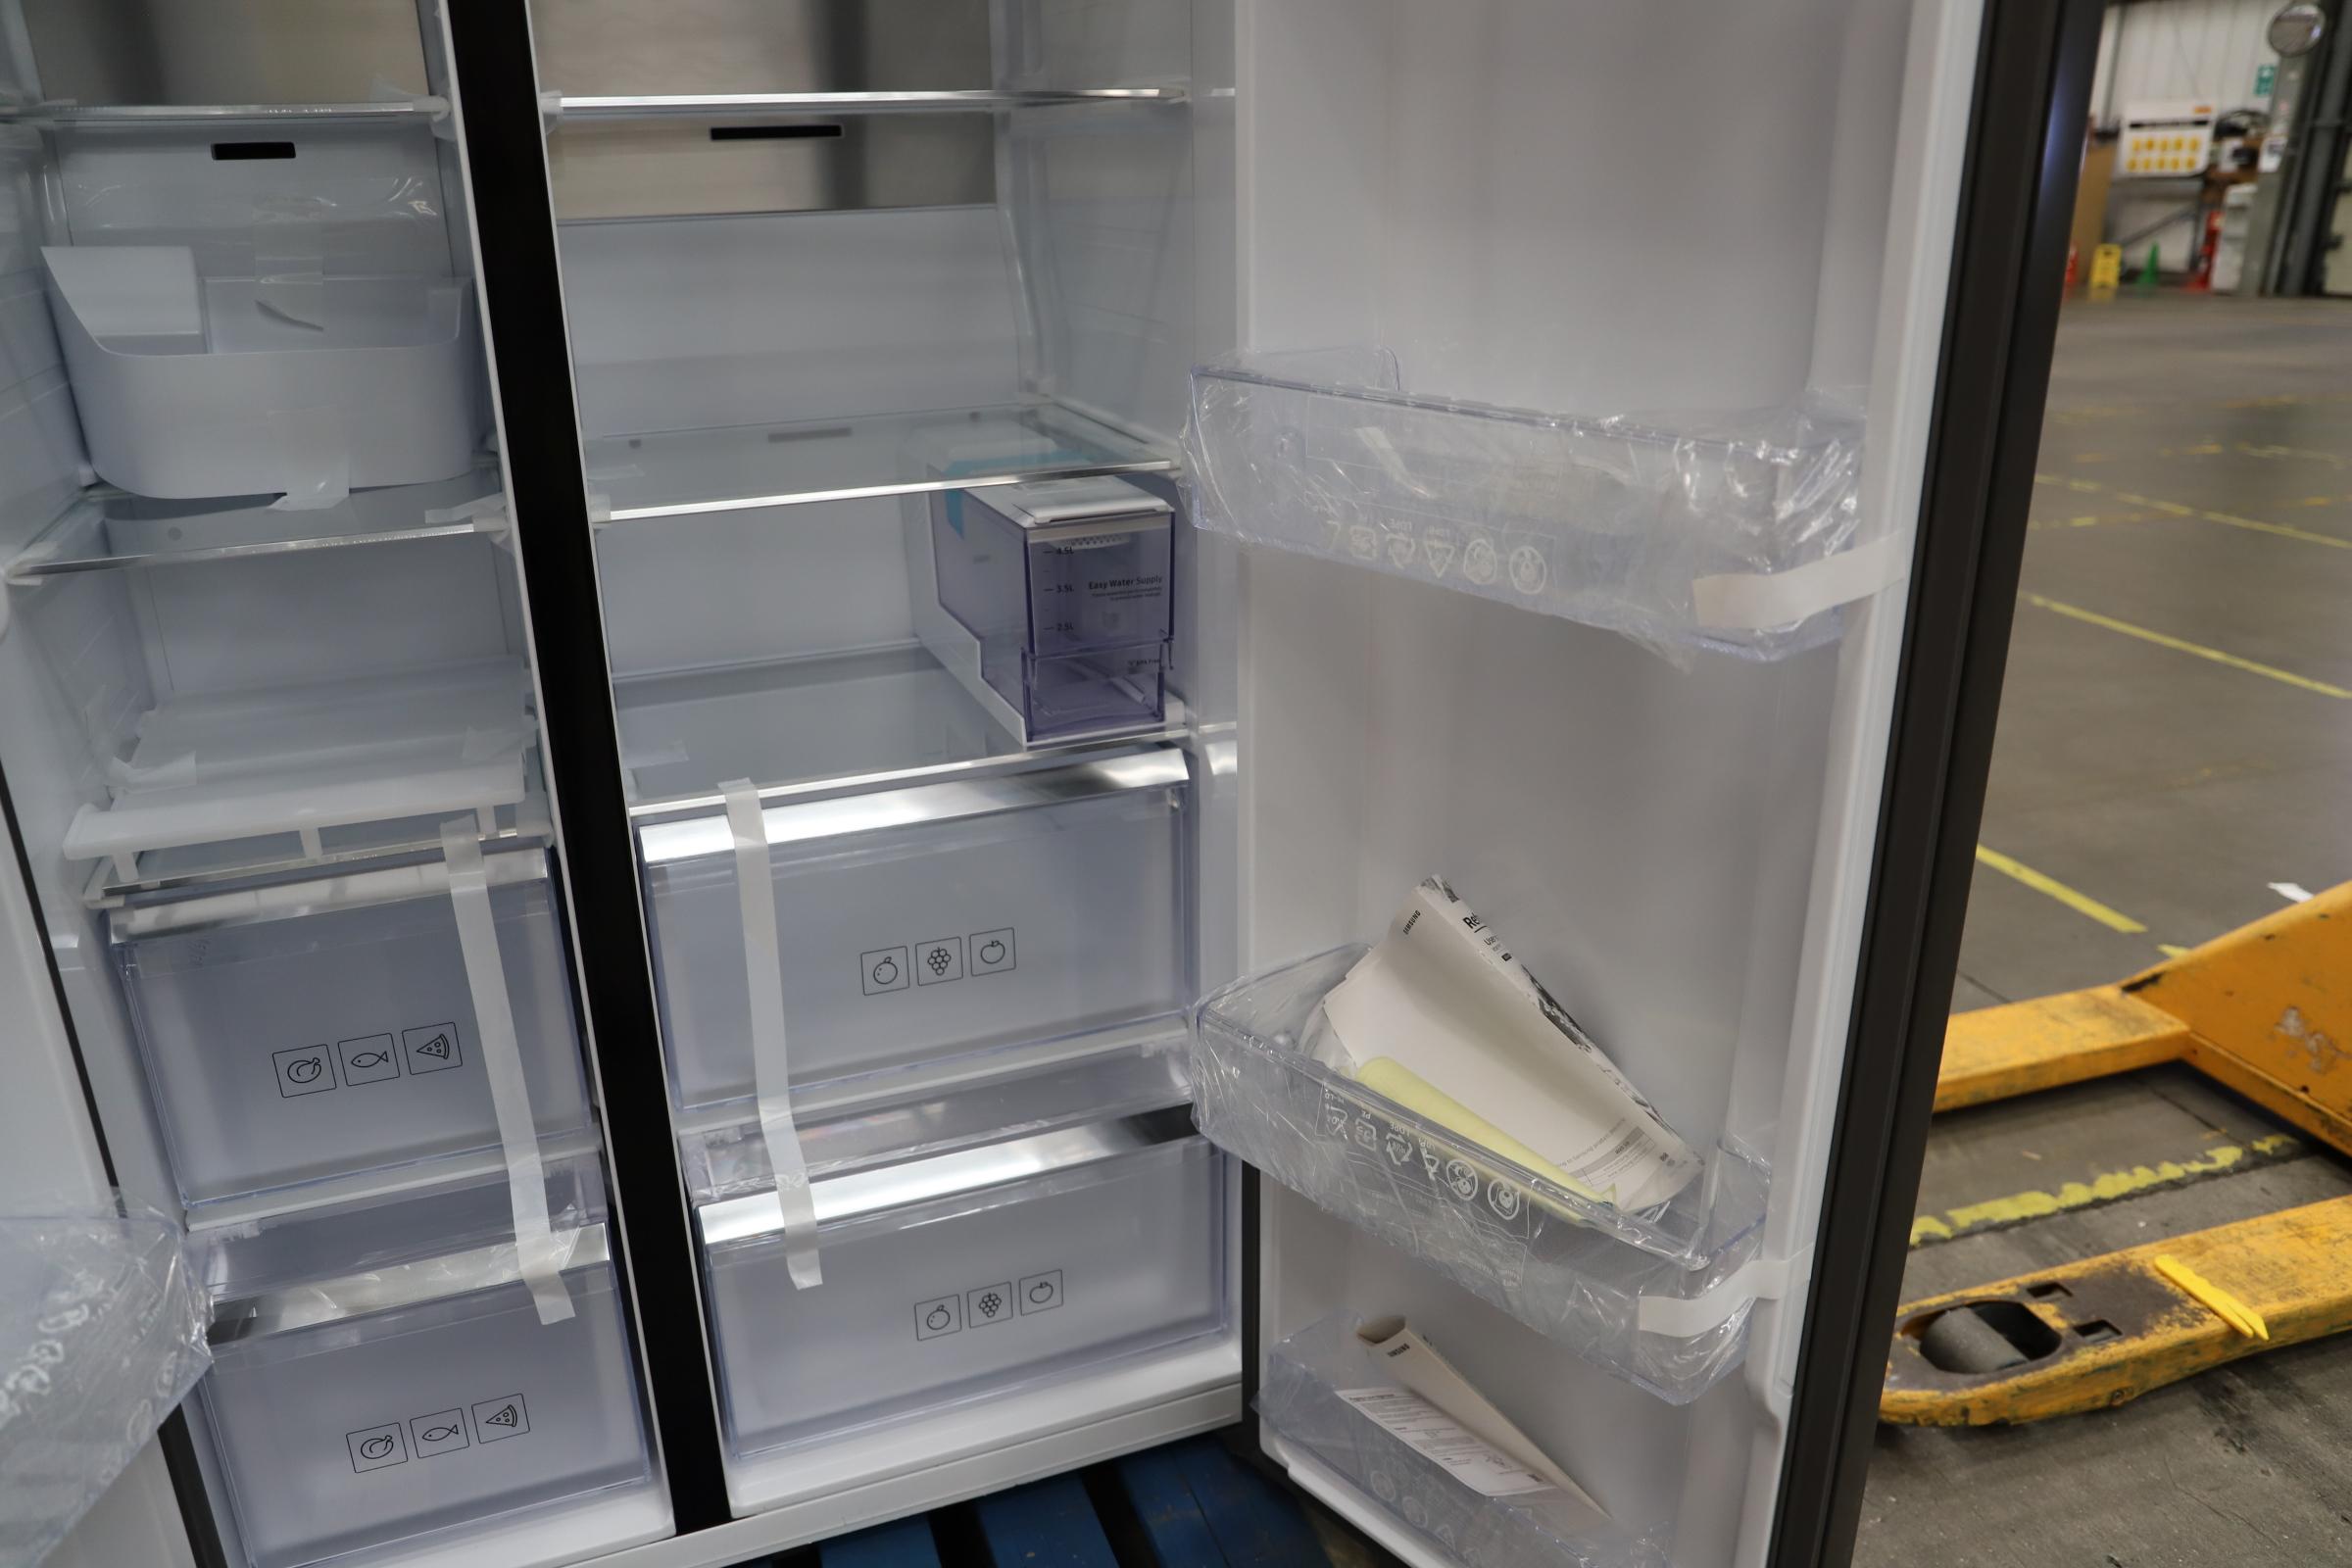 Pallet of 1 Samsung Water & Ice Fridge freezer. Latest selling price £1,799.99 - Image 8 of 10